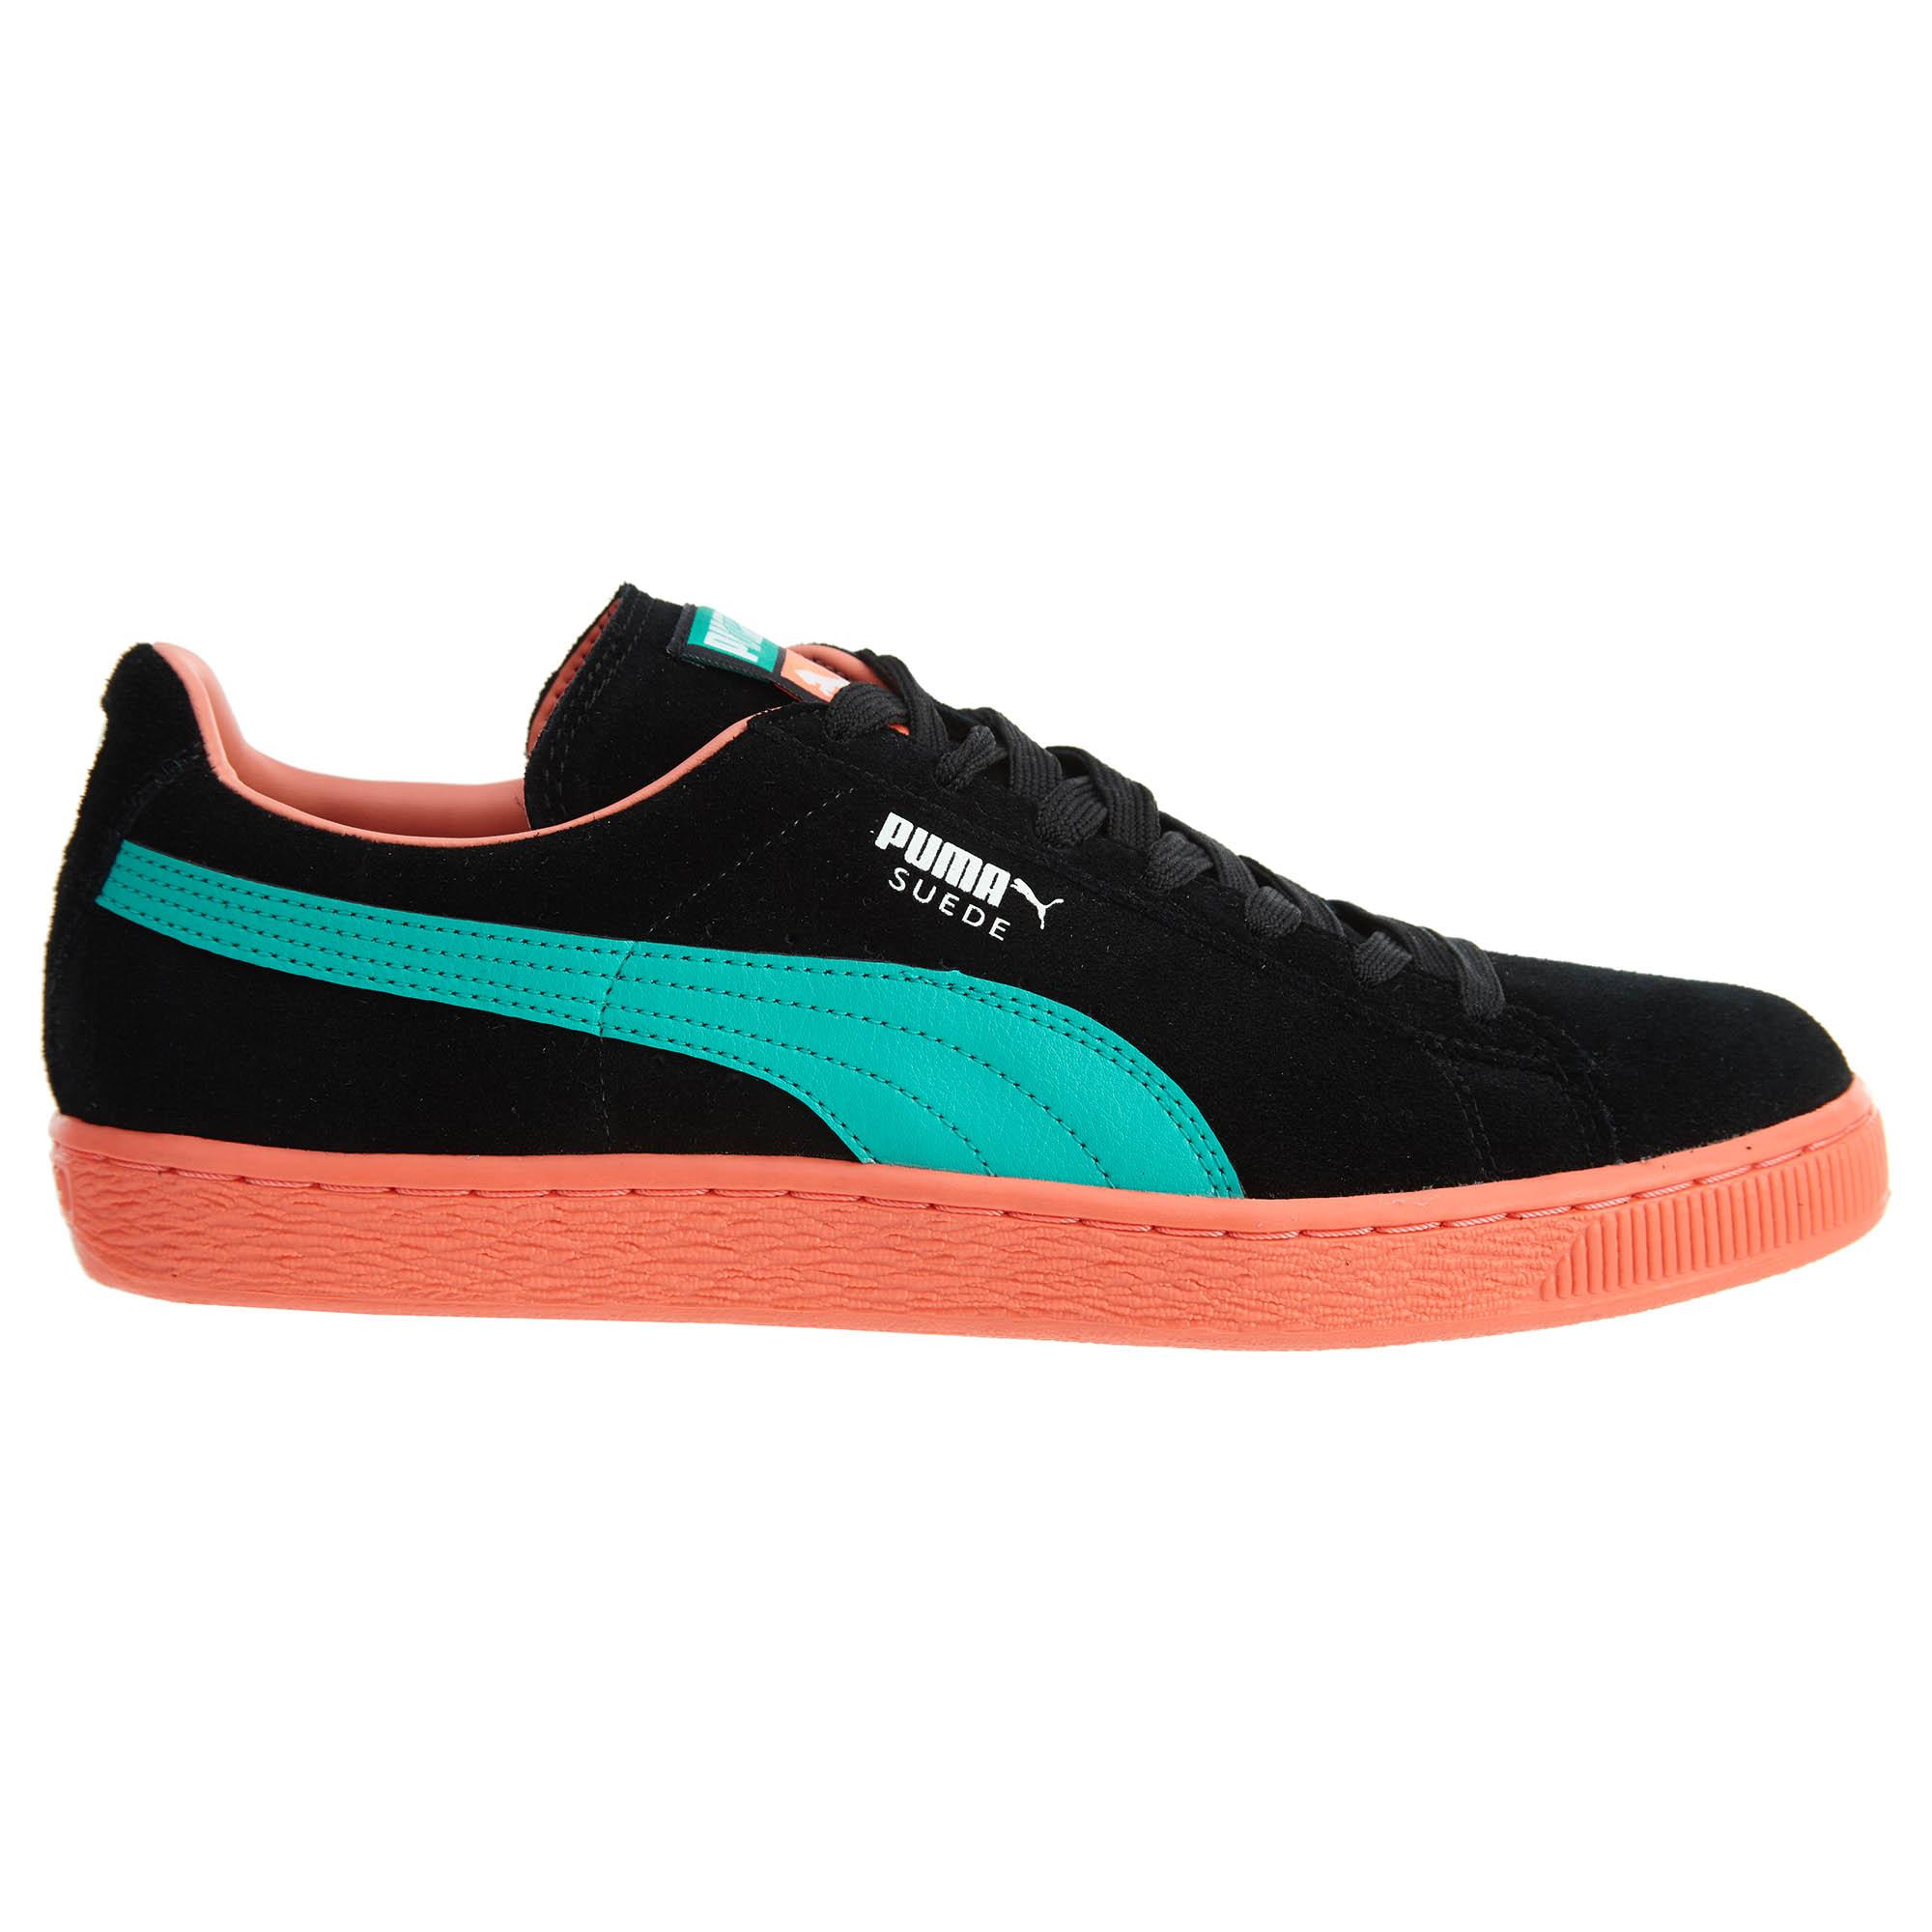 Puma Suede Classic Lfs Black/Fluo Teal